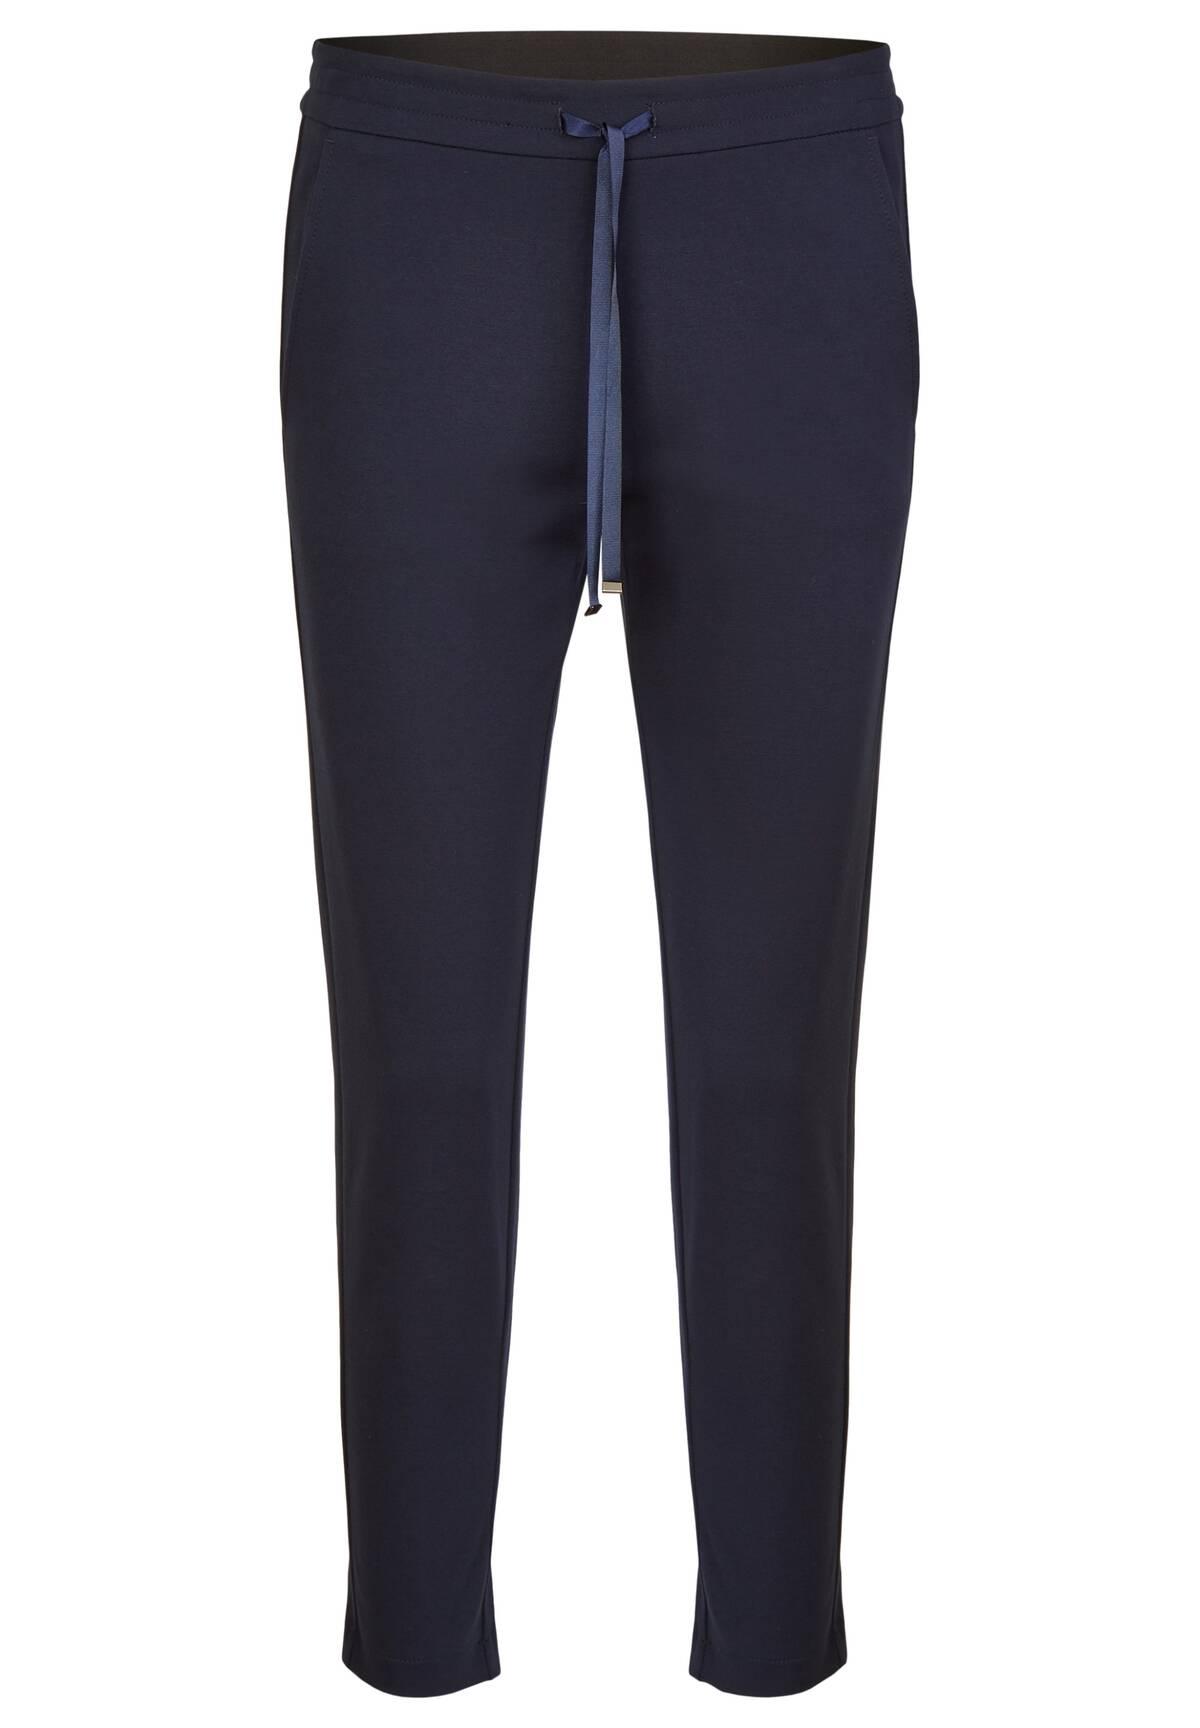 Modische Hose mit Tunnelzug / Jogg Pants